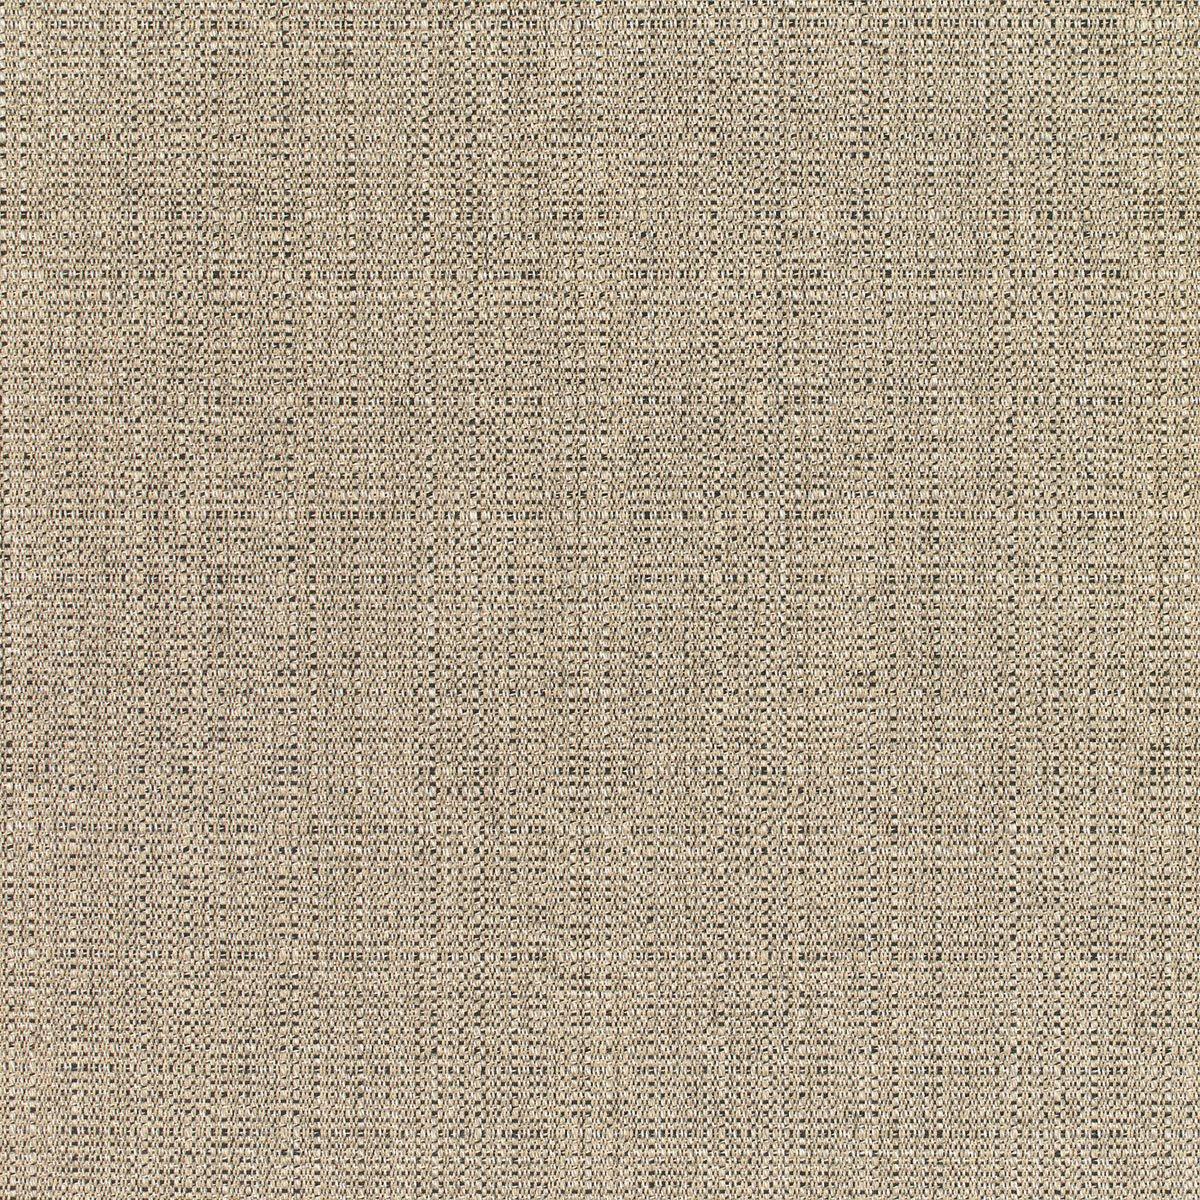 - Amazon.com: Sunbrella Outdoor Linen Stone Fabric By The Yard